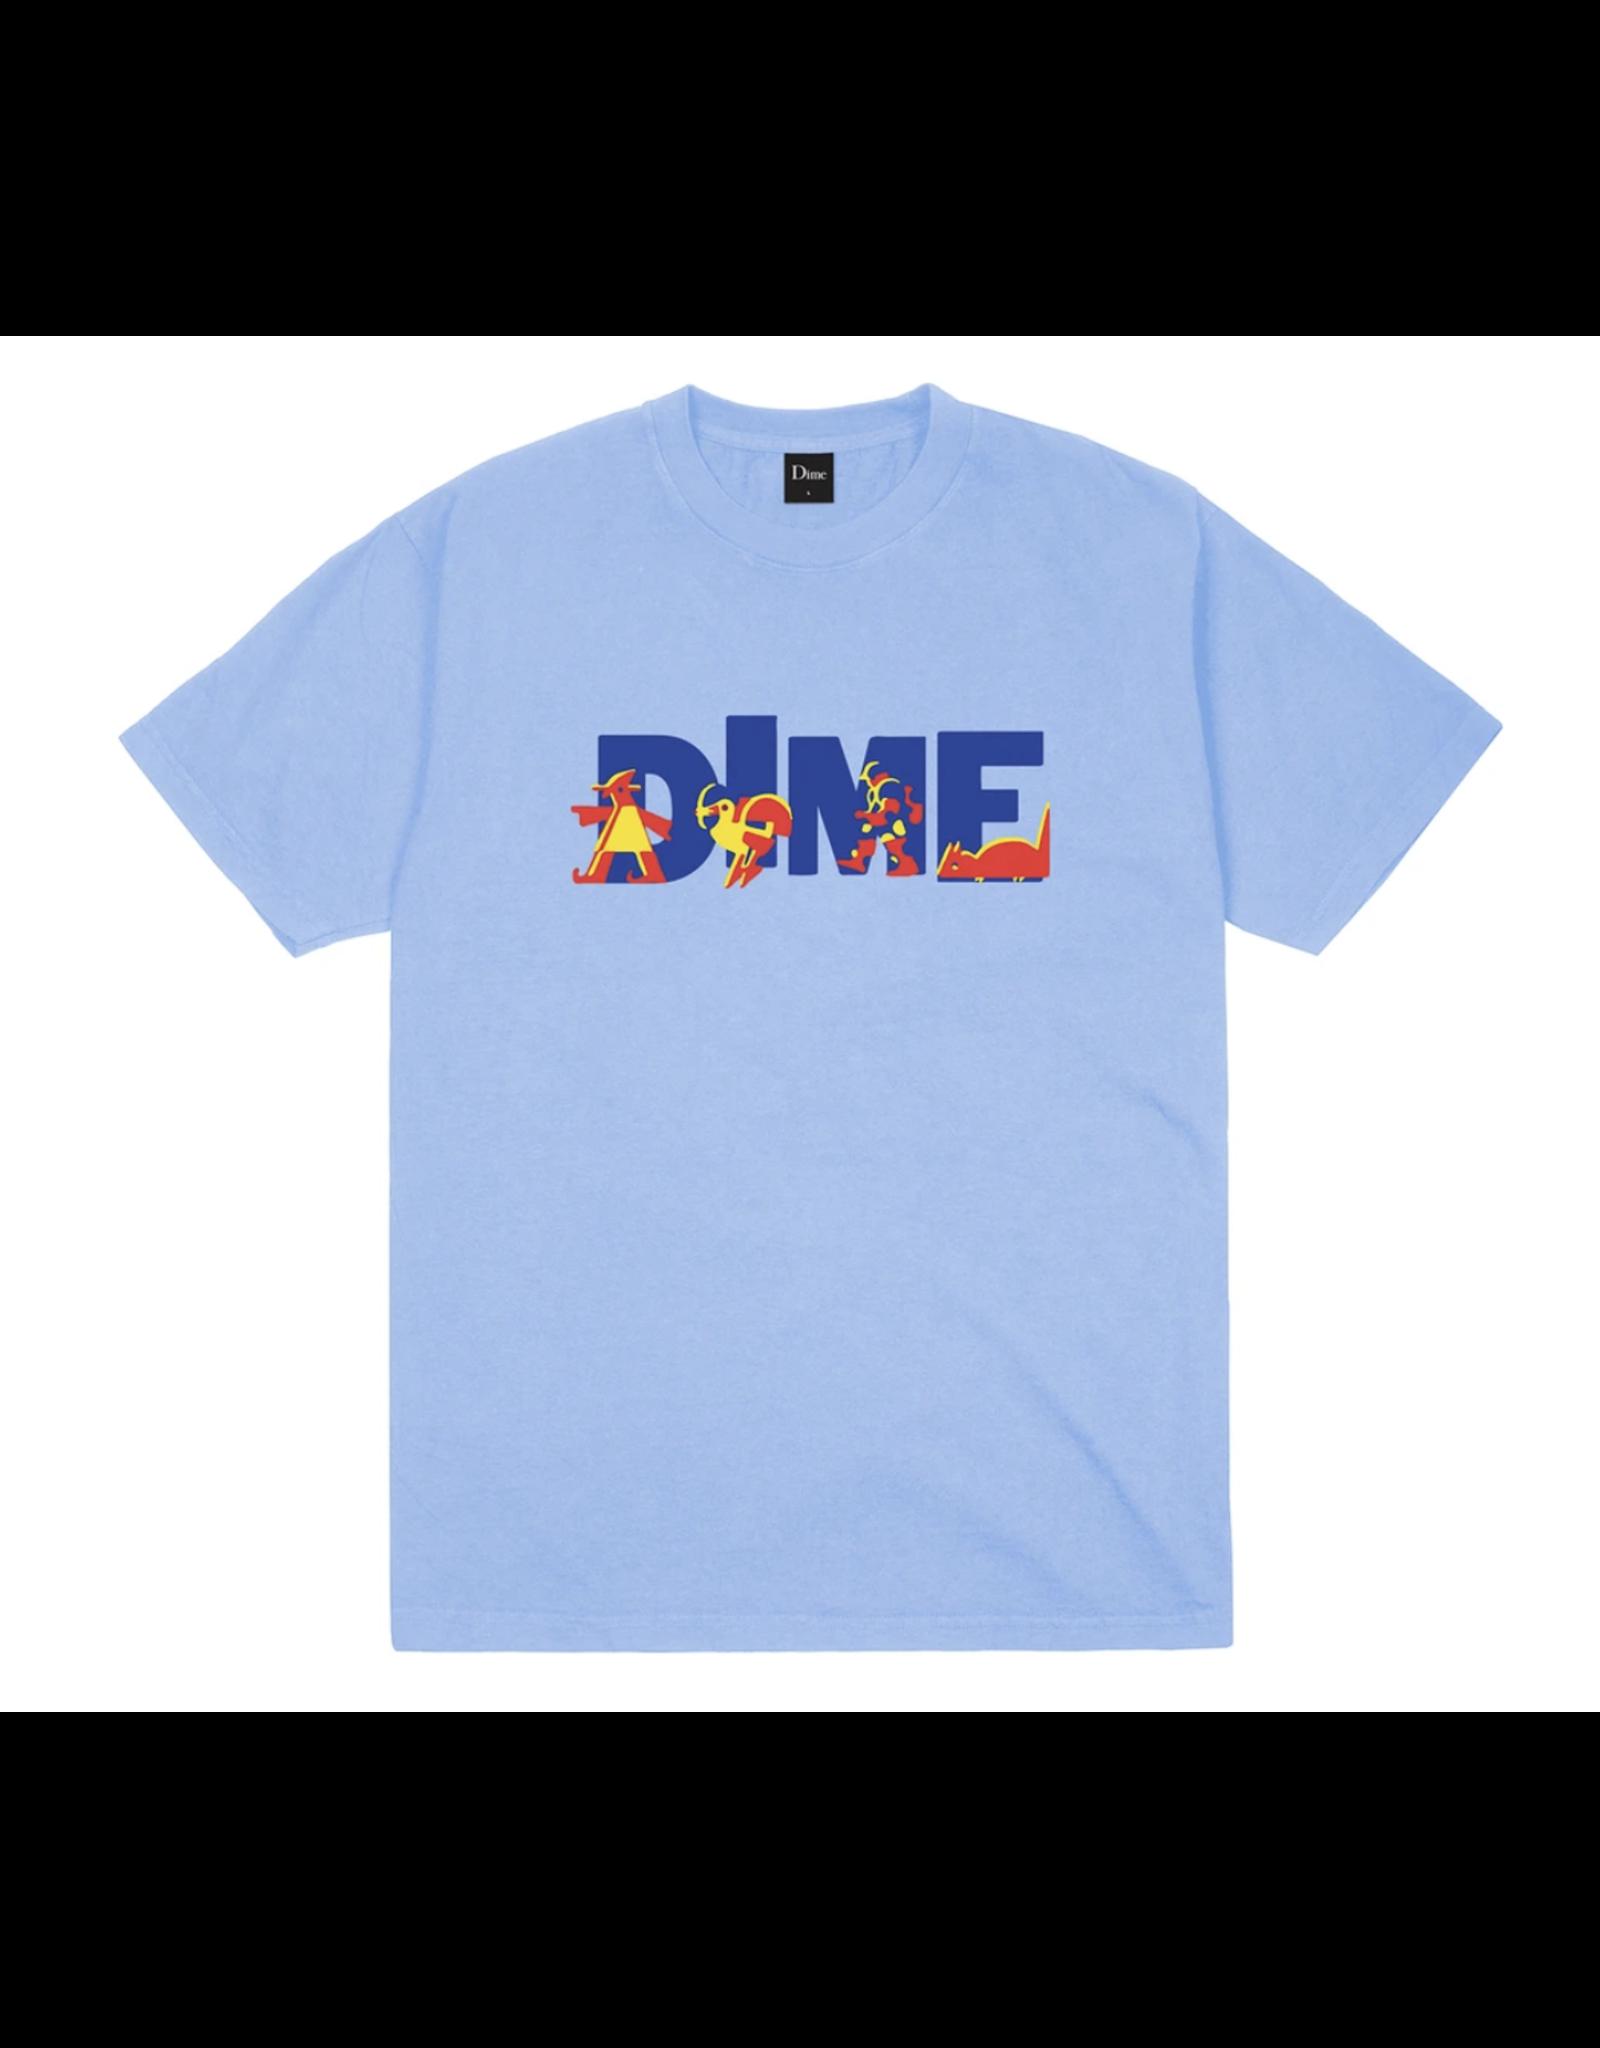 Dime Toy Store T-Shirt - Carolina Blue